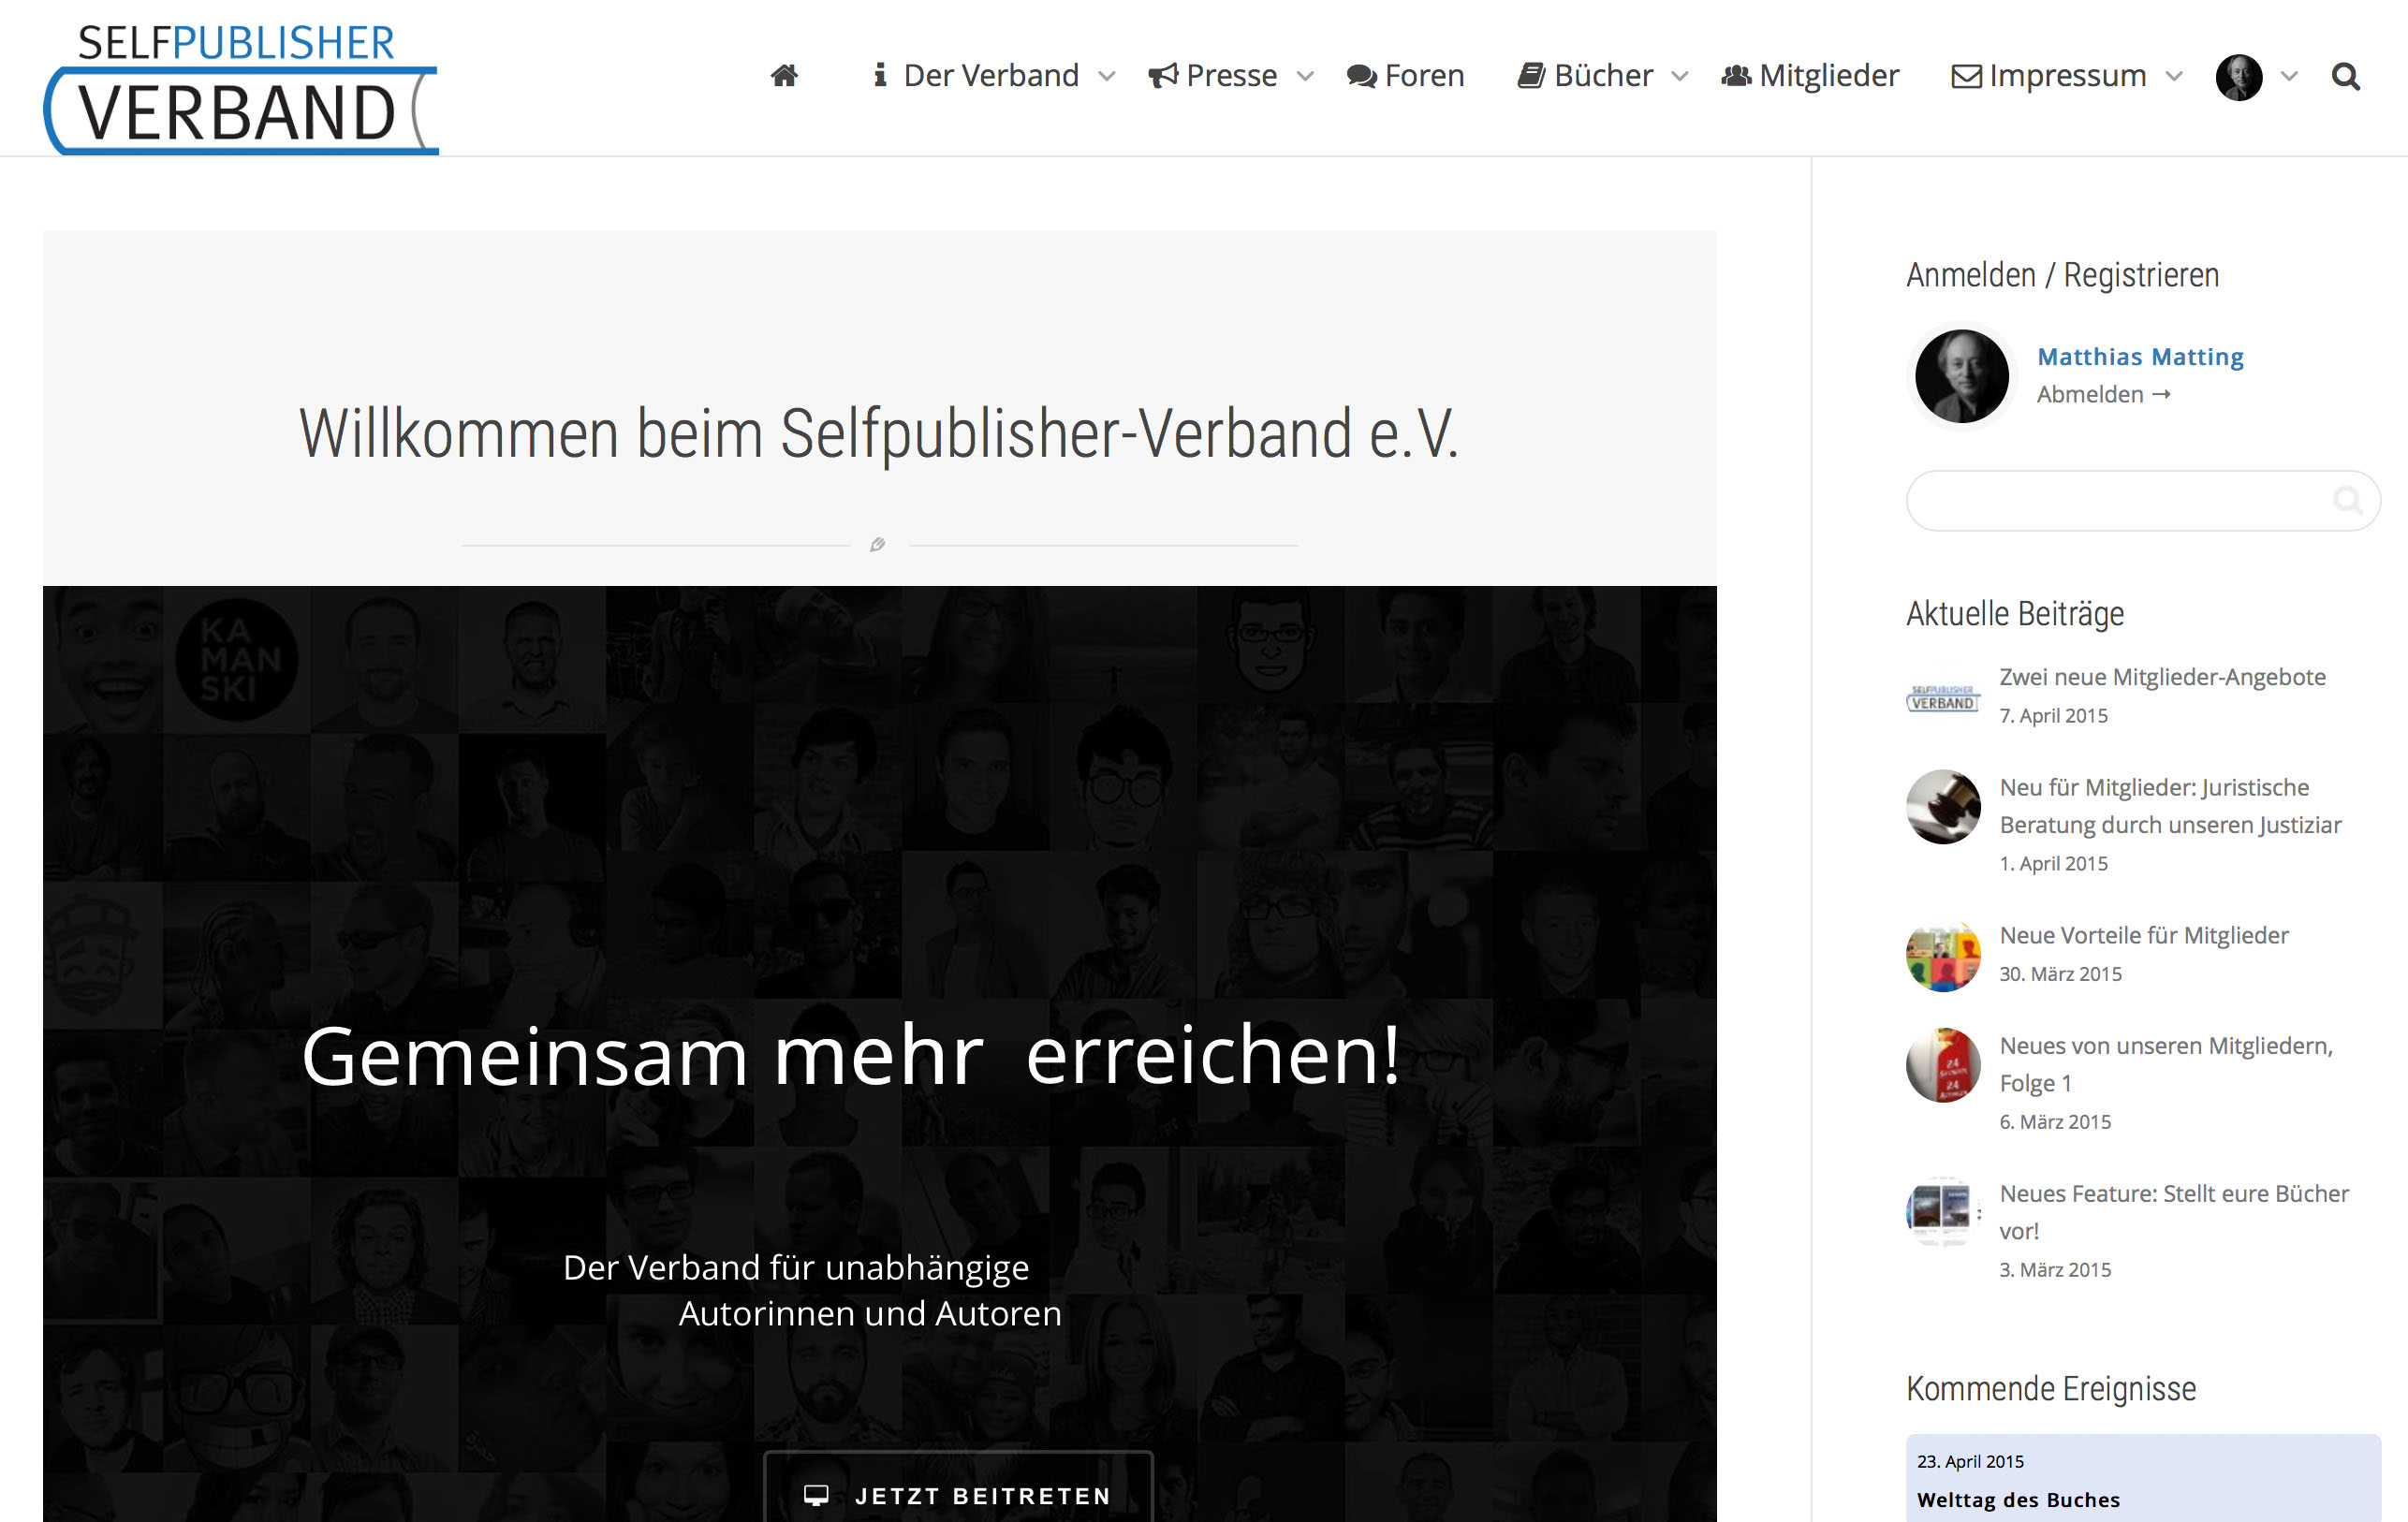 Selfpublisher-Verband.de